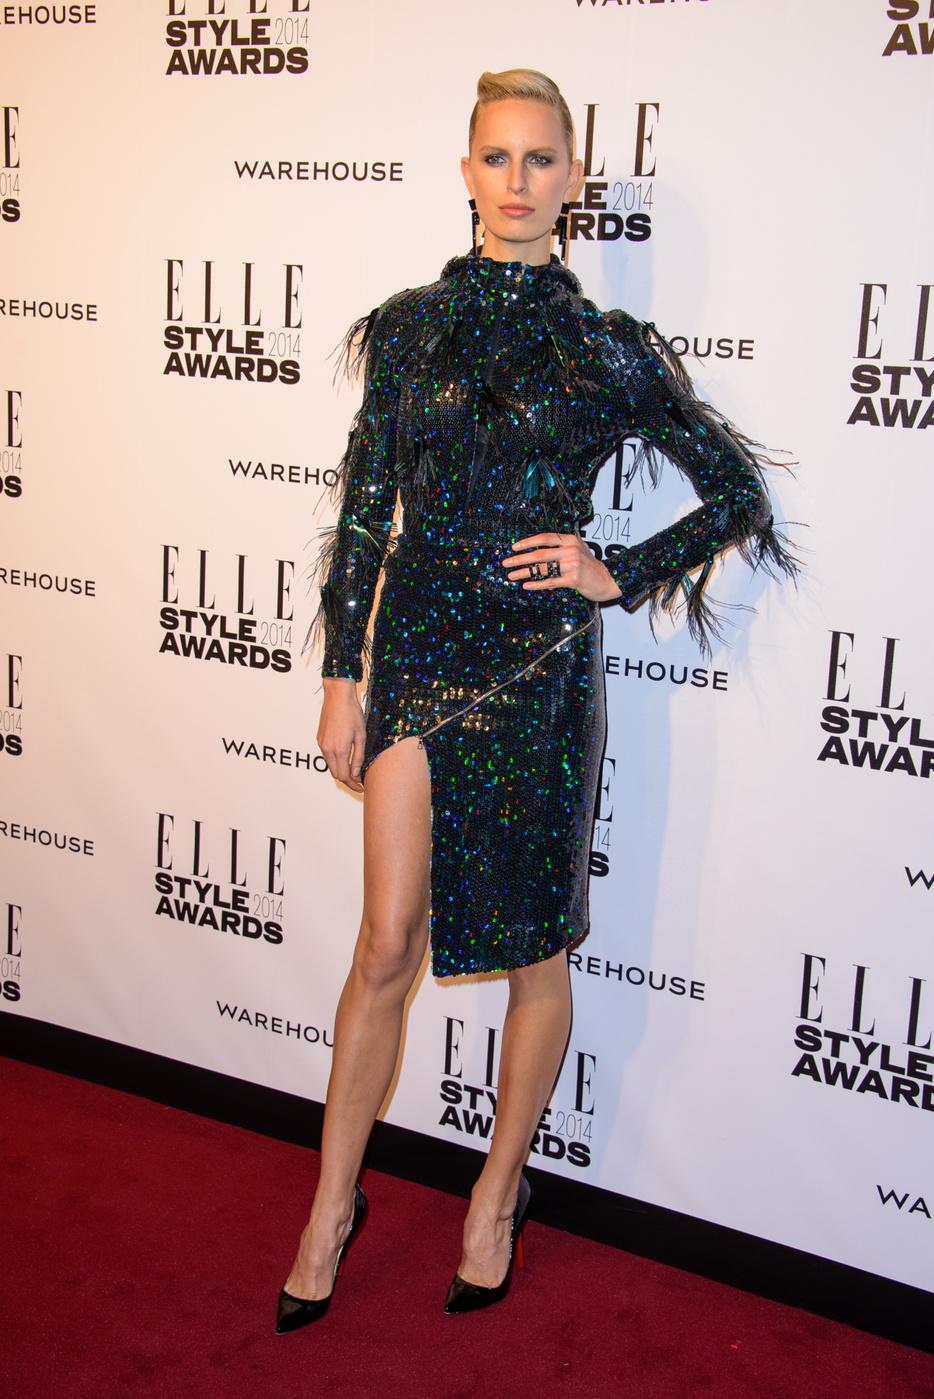 Karolina Kurkova attends  the Elle Style Awards 2014 at one Embankment in London